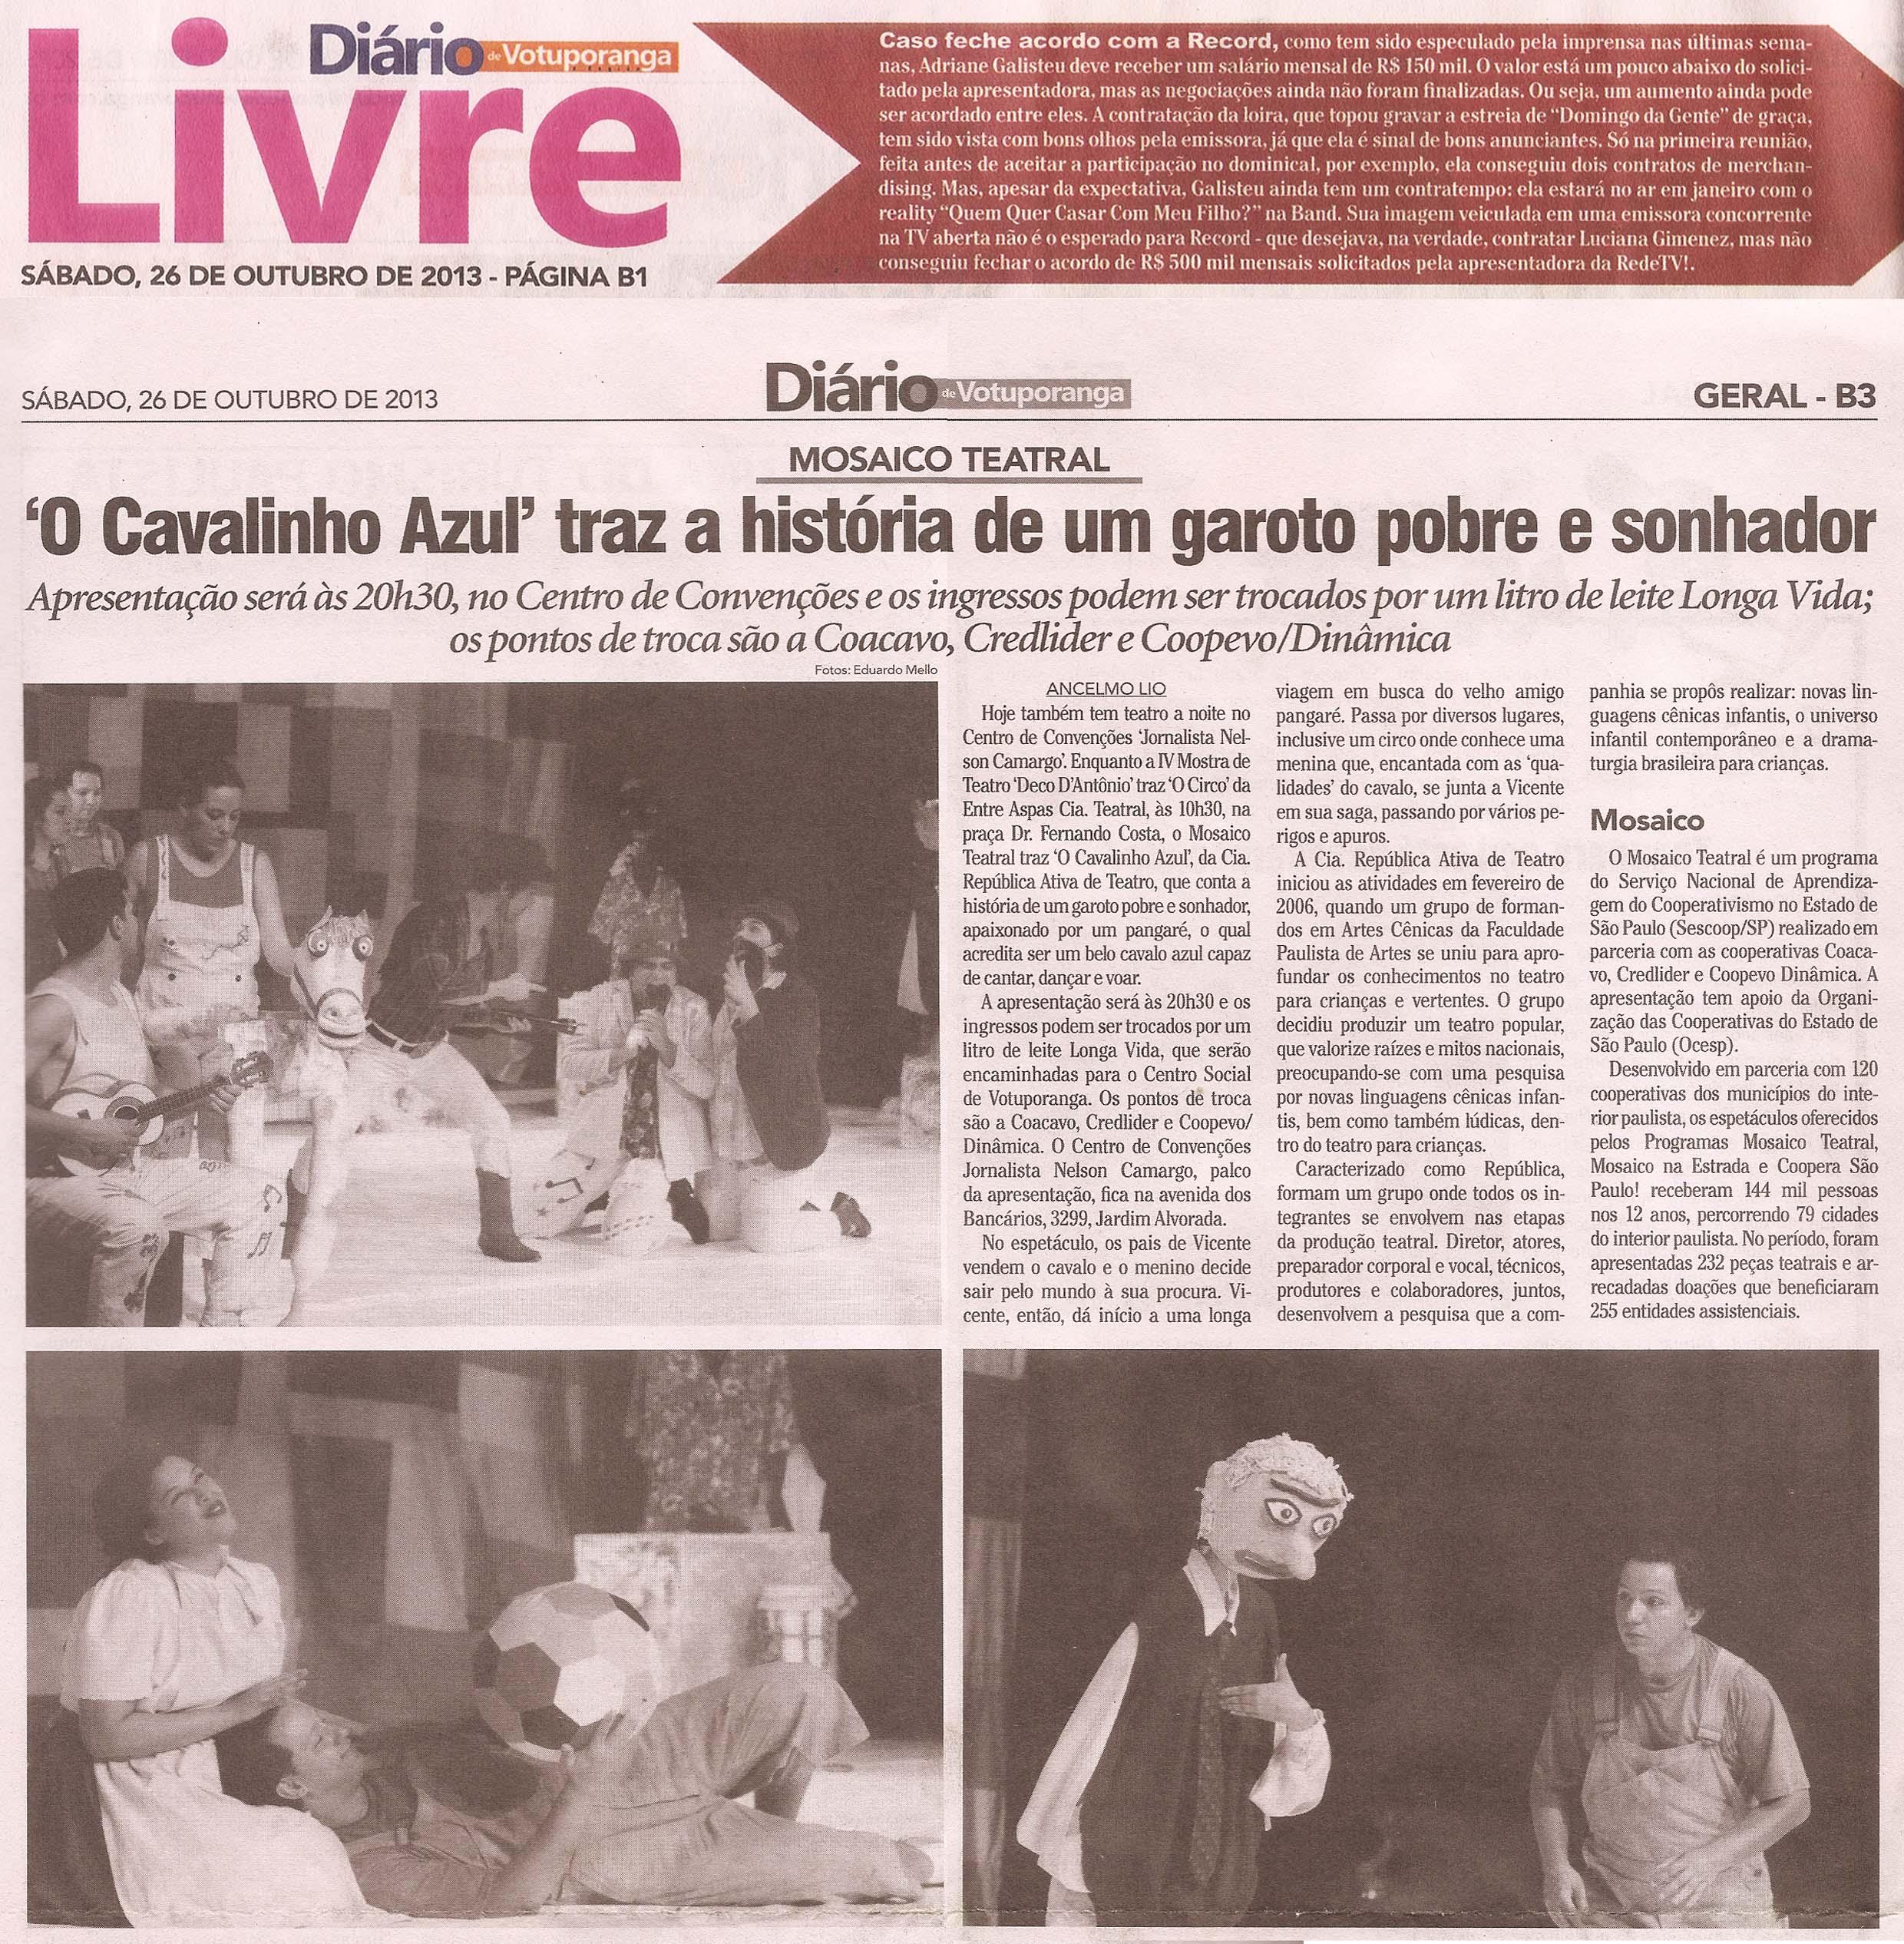 Cavalinho - Mosaico Teatral 2013